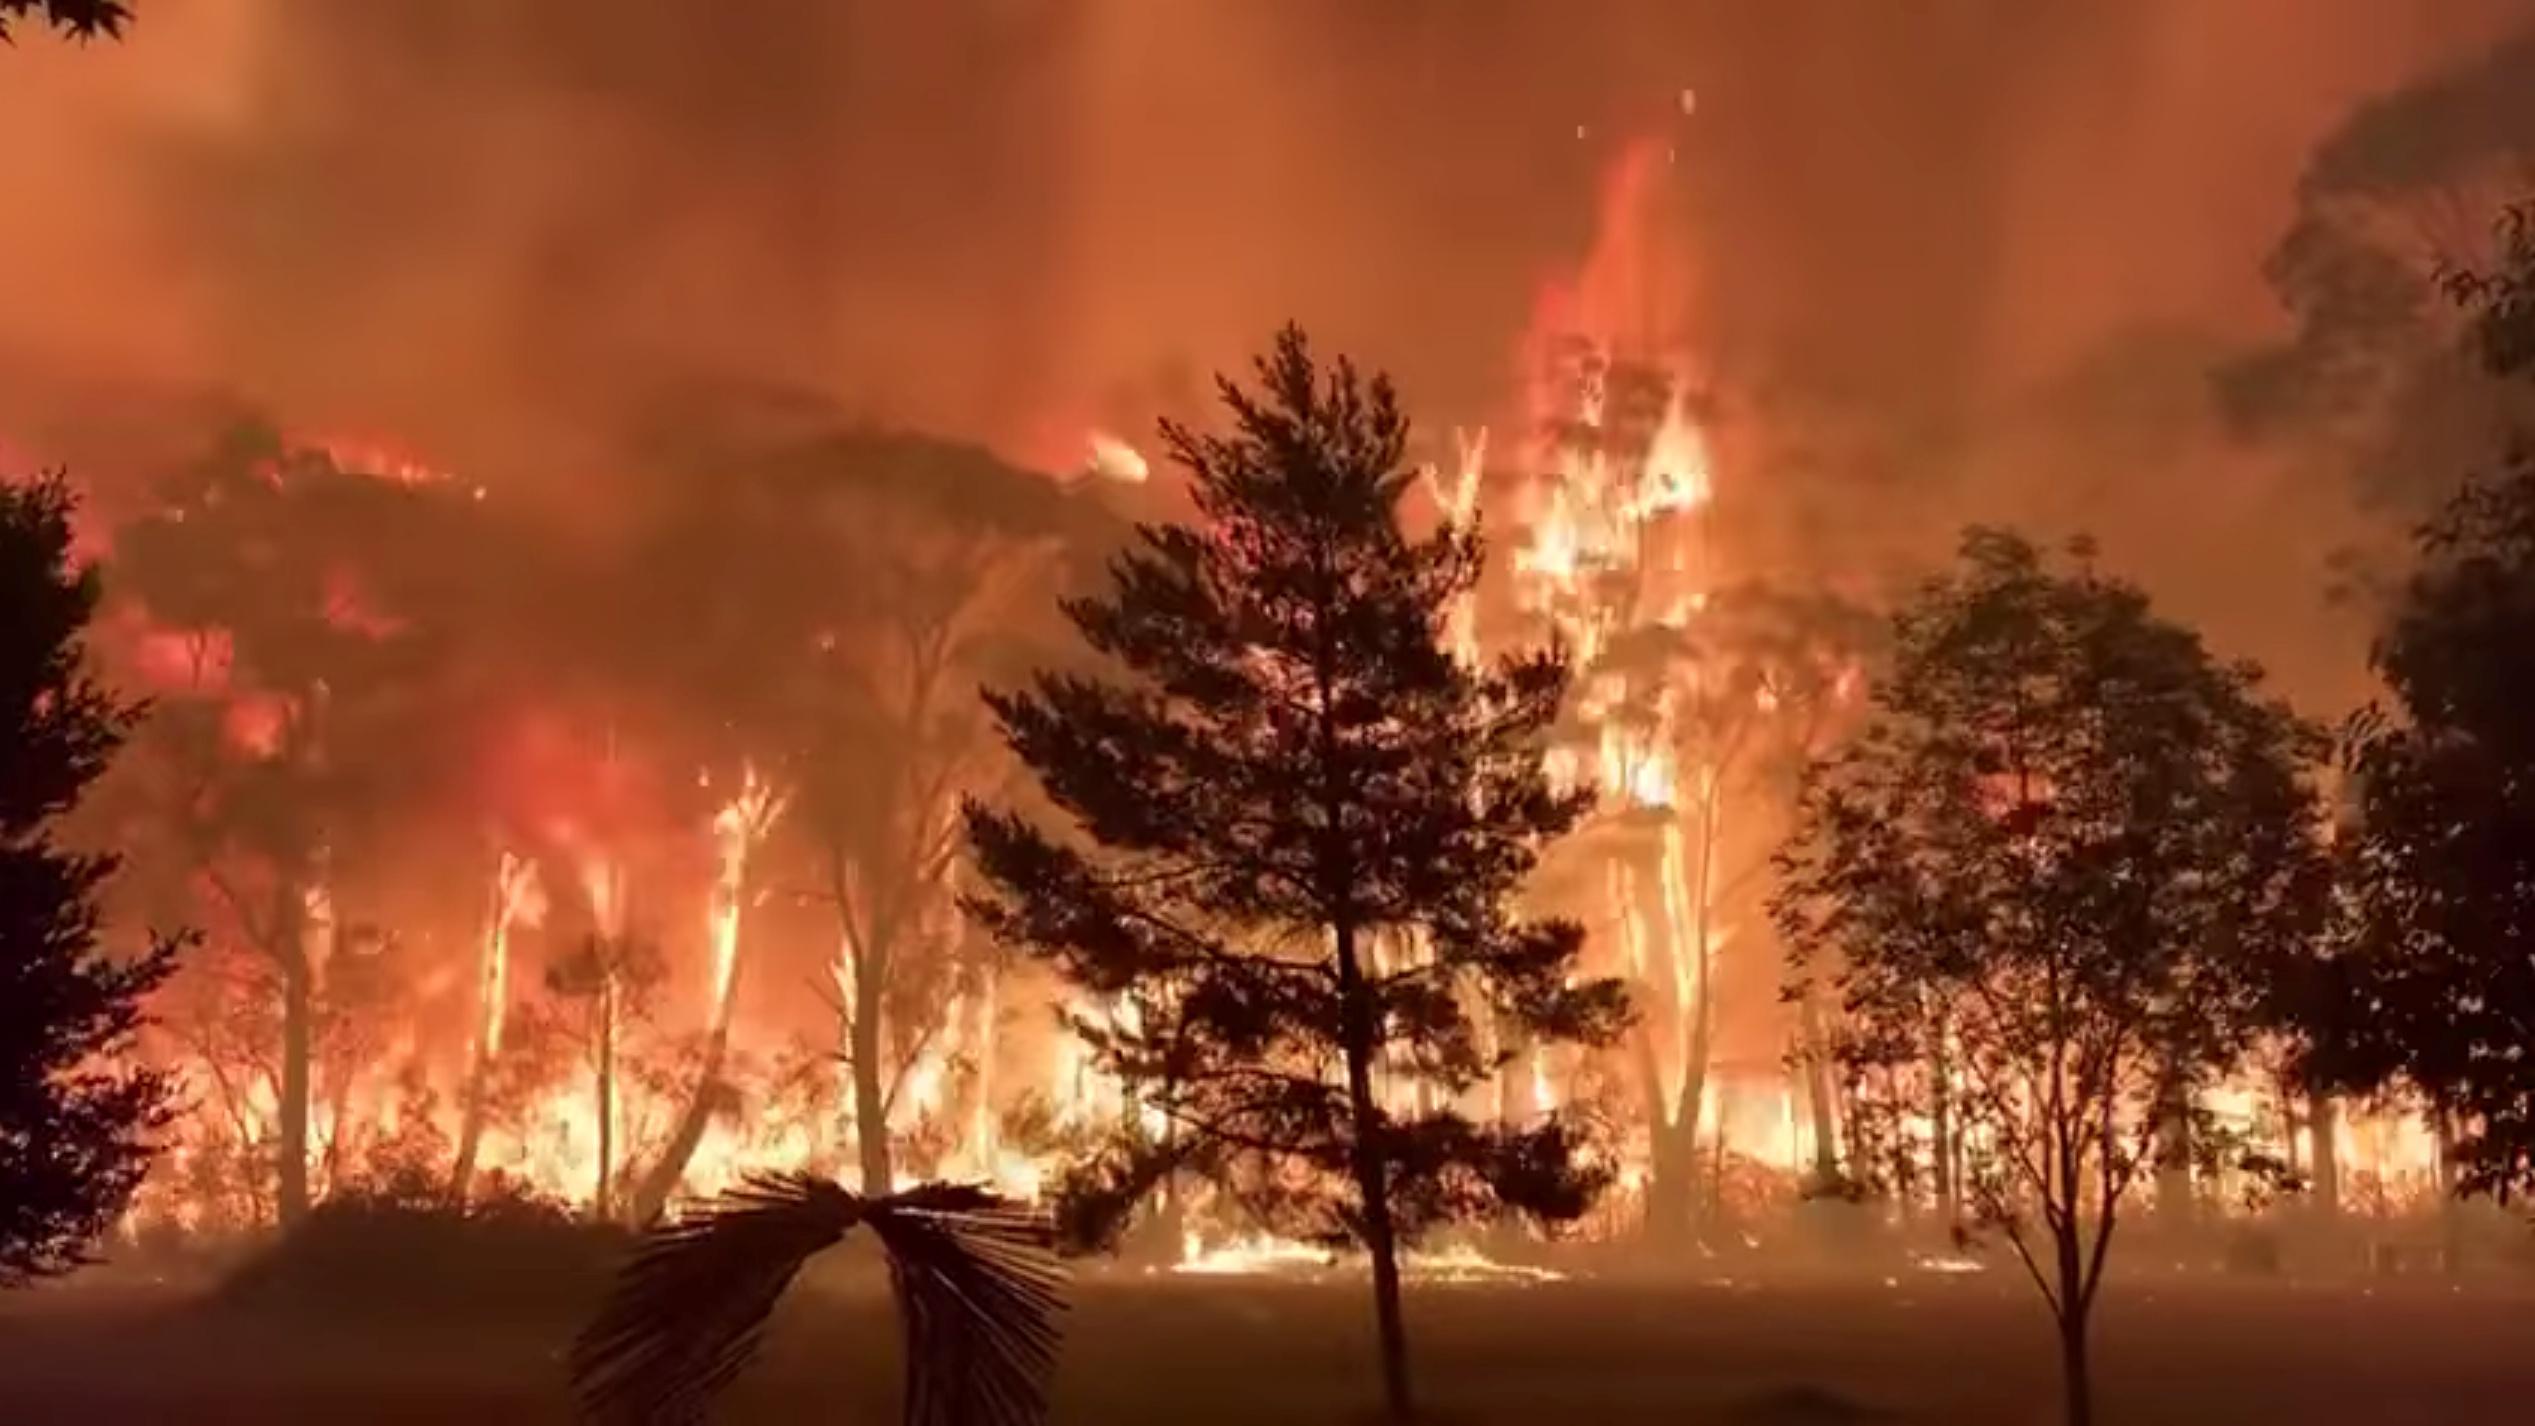 Australia firefighters accidentally spread blaze ahead of heatwave